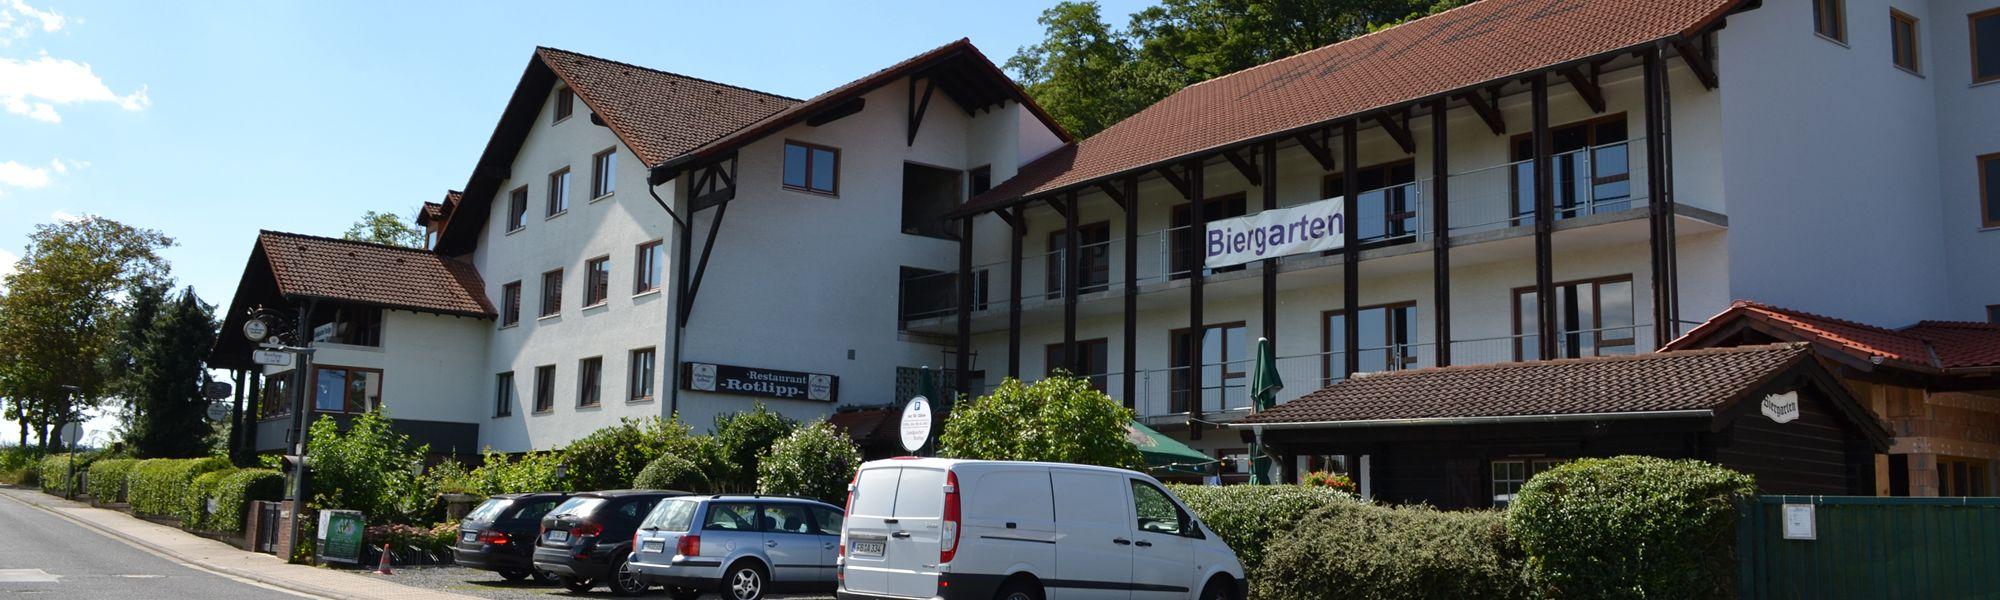 Rotlipp Ortenberg